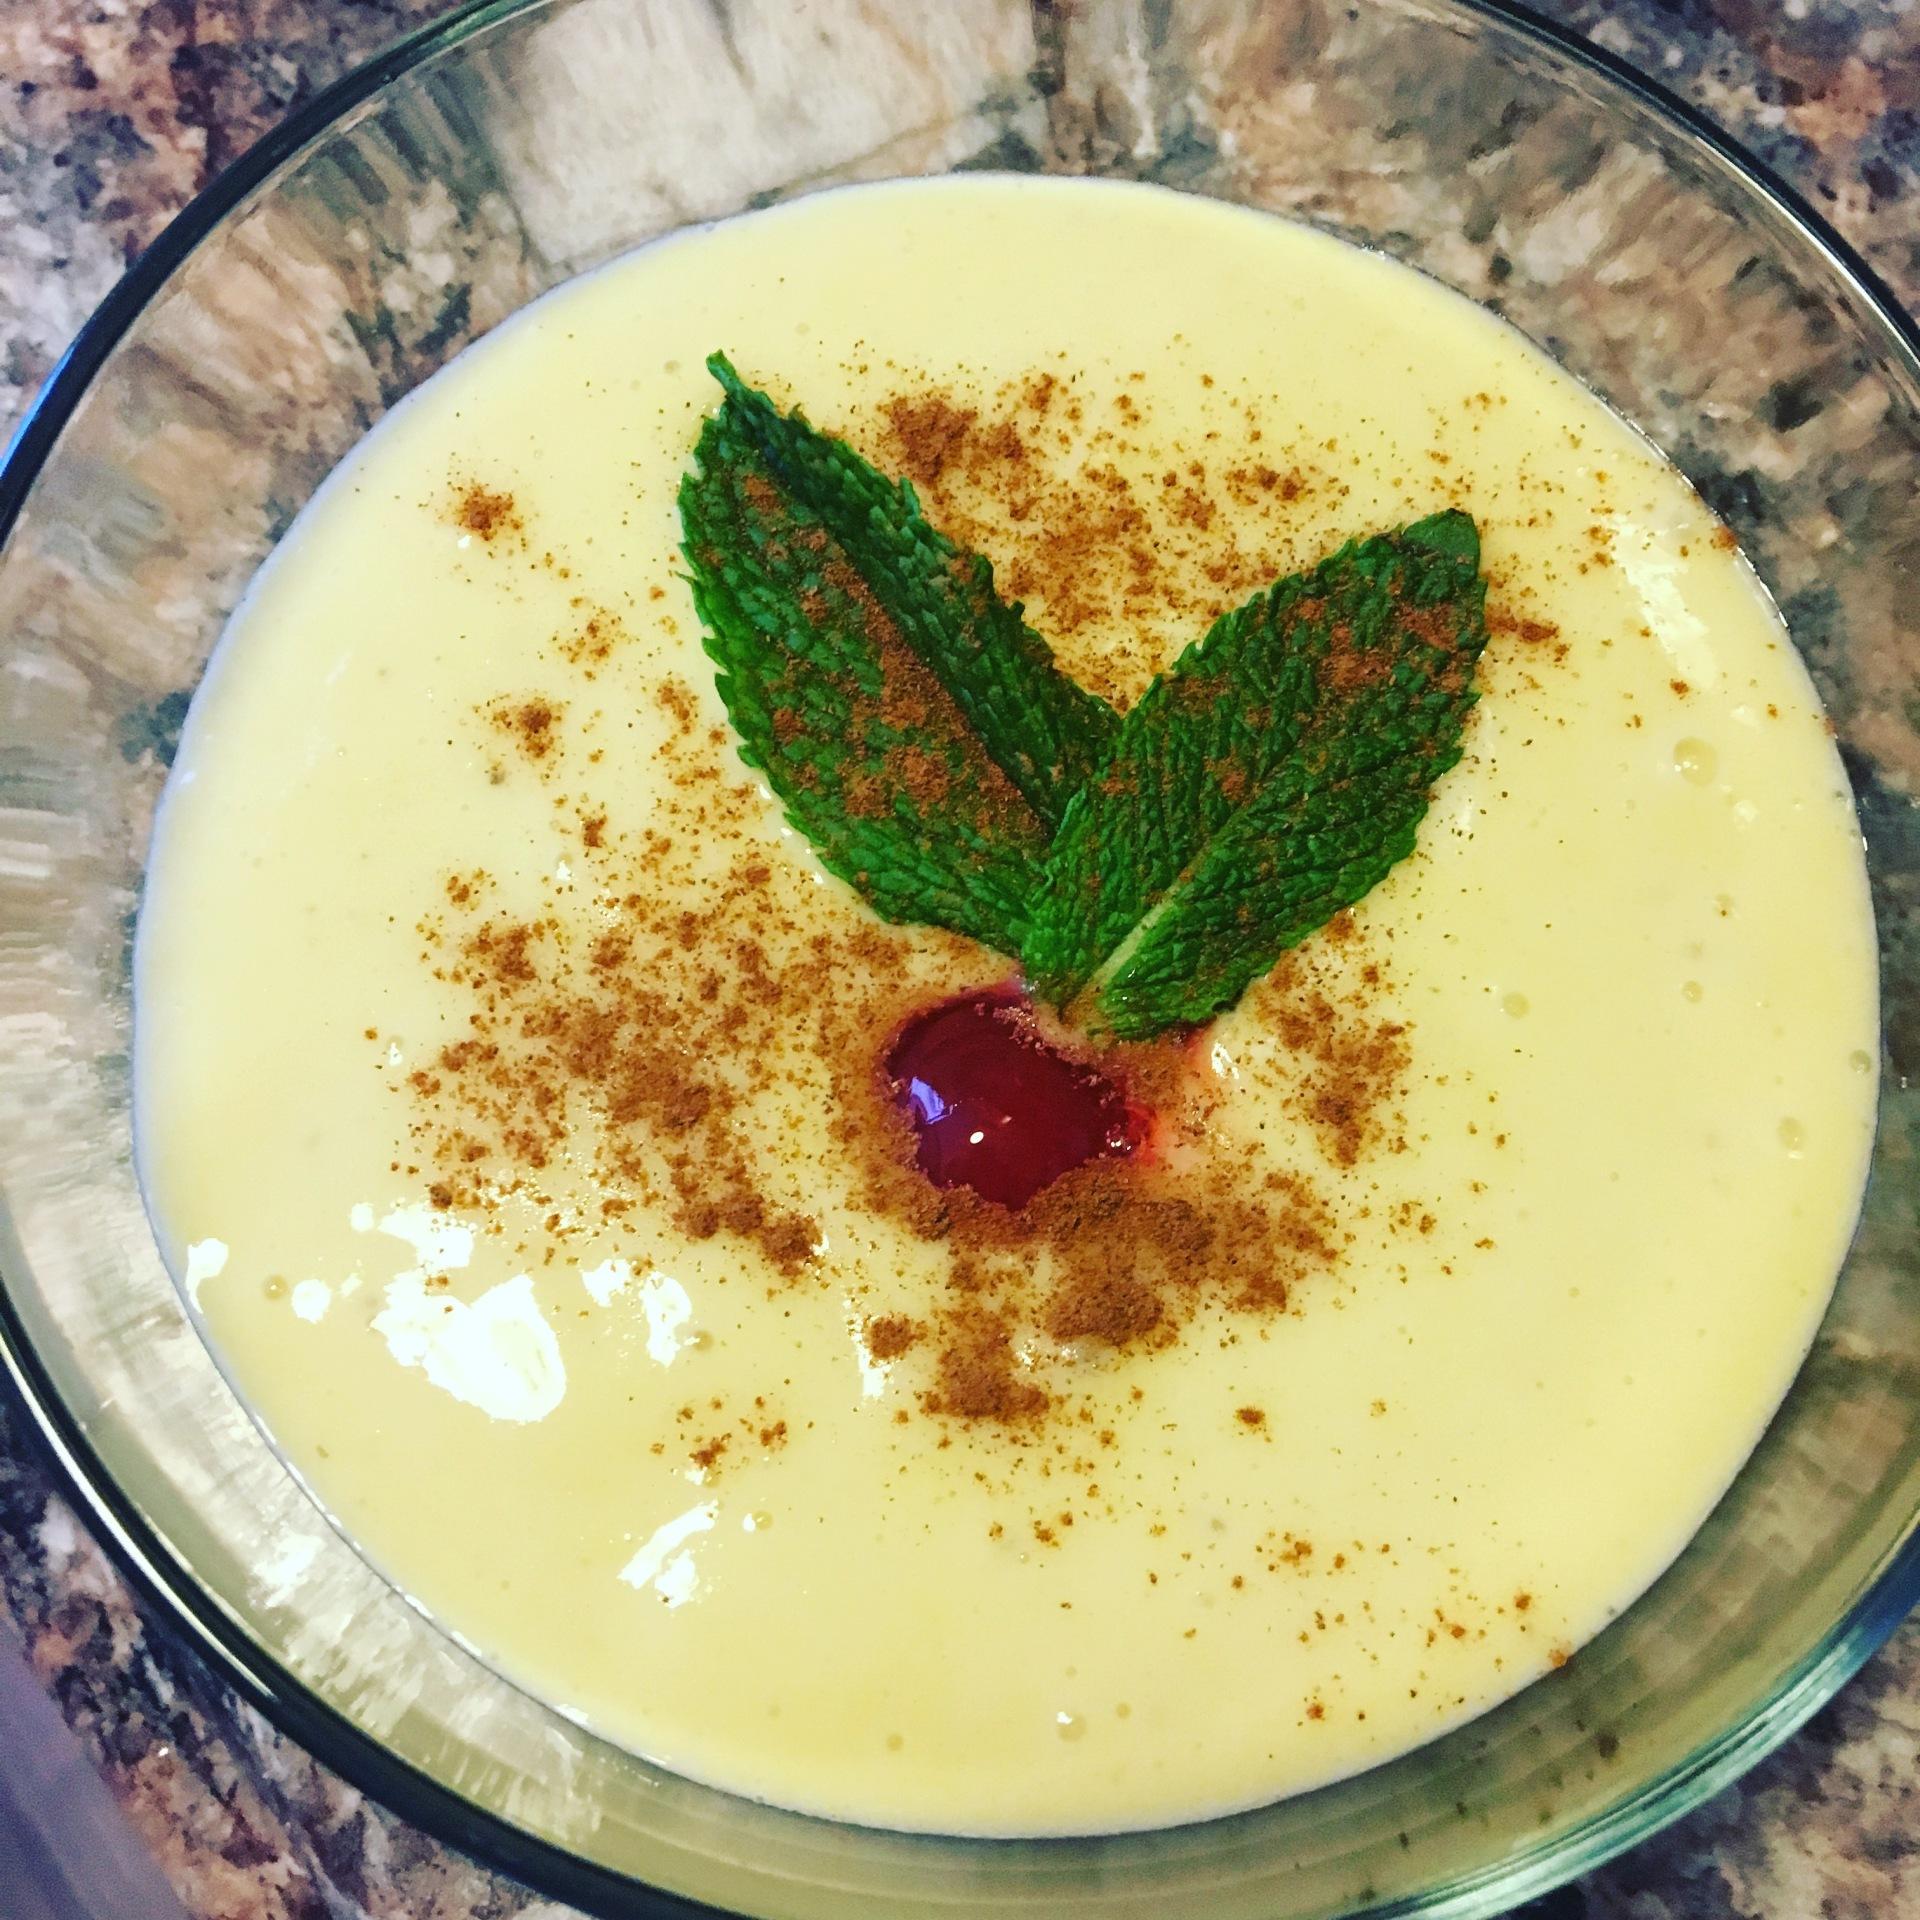 Vegan Blender 21 day smoothie bowl challenge